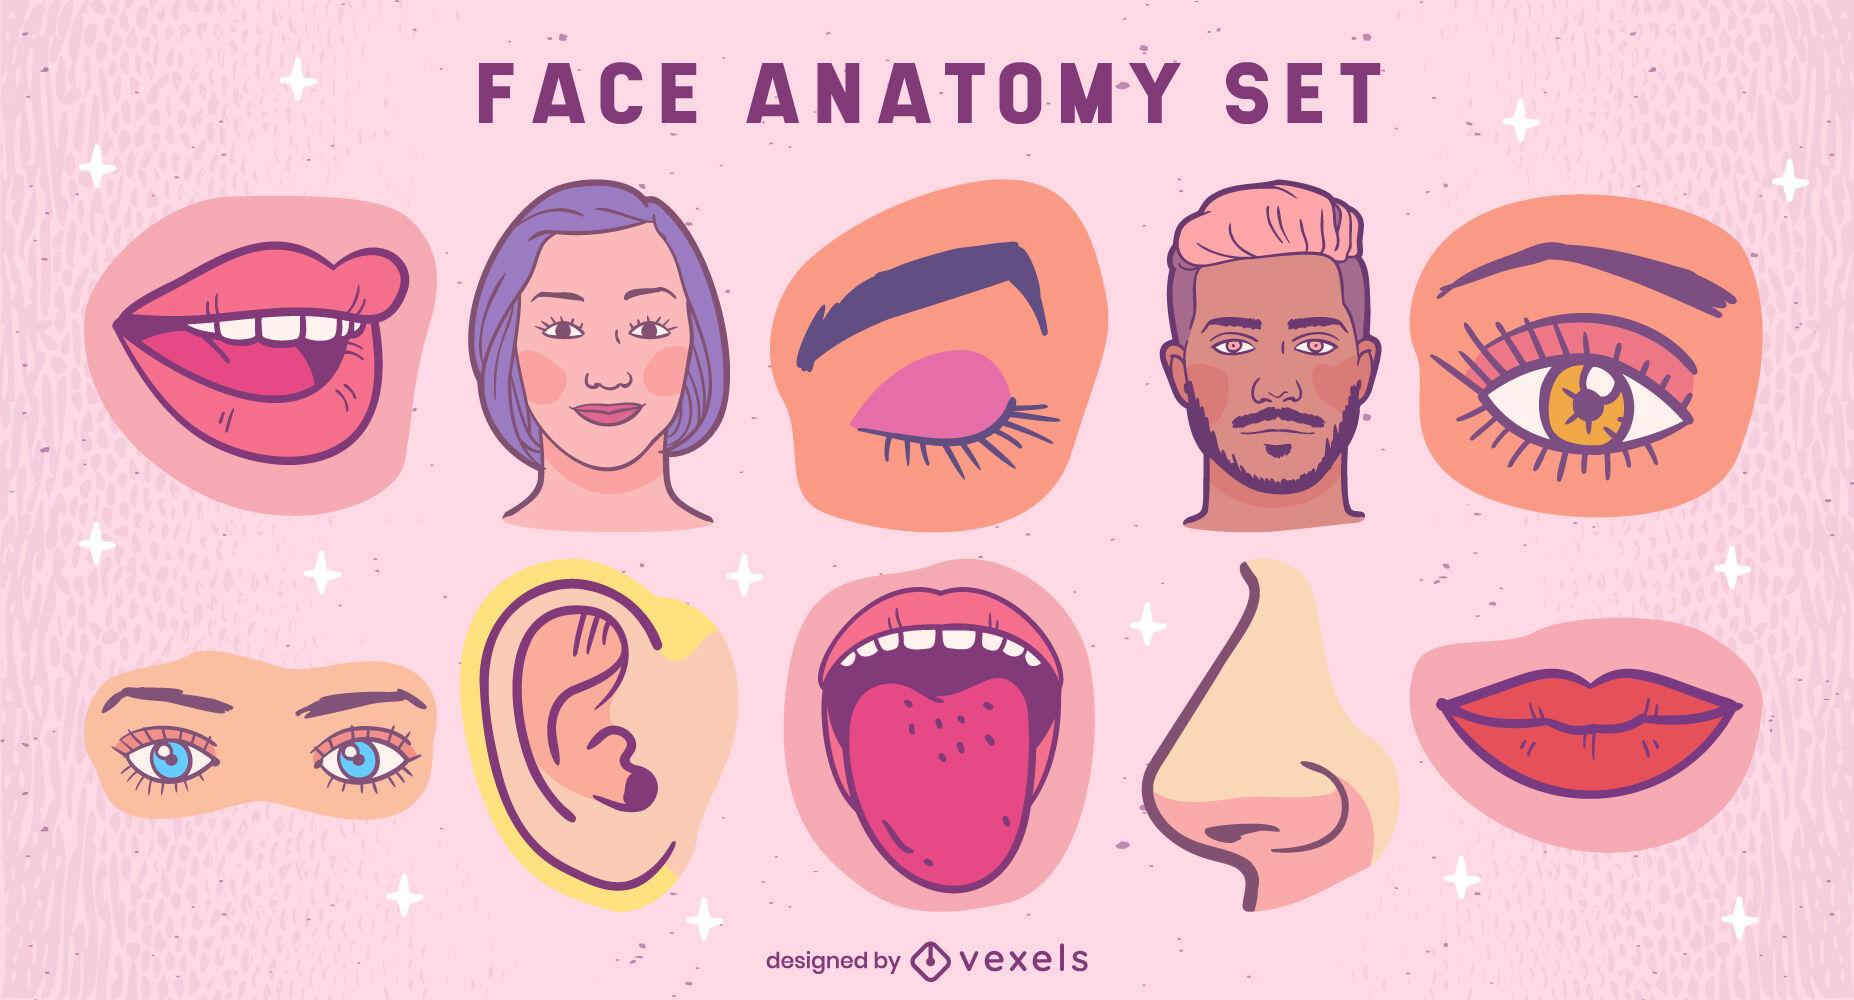 Face anatomy illustrations set